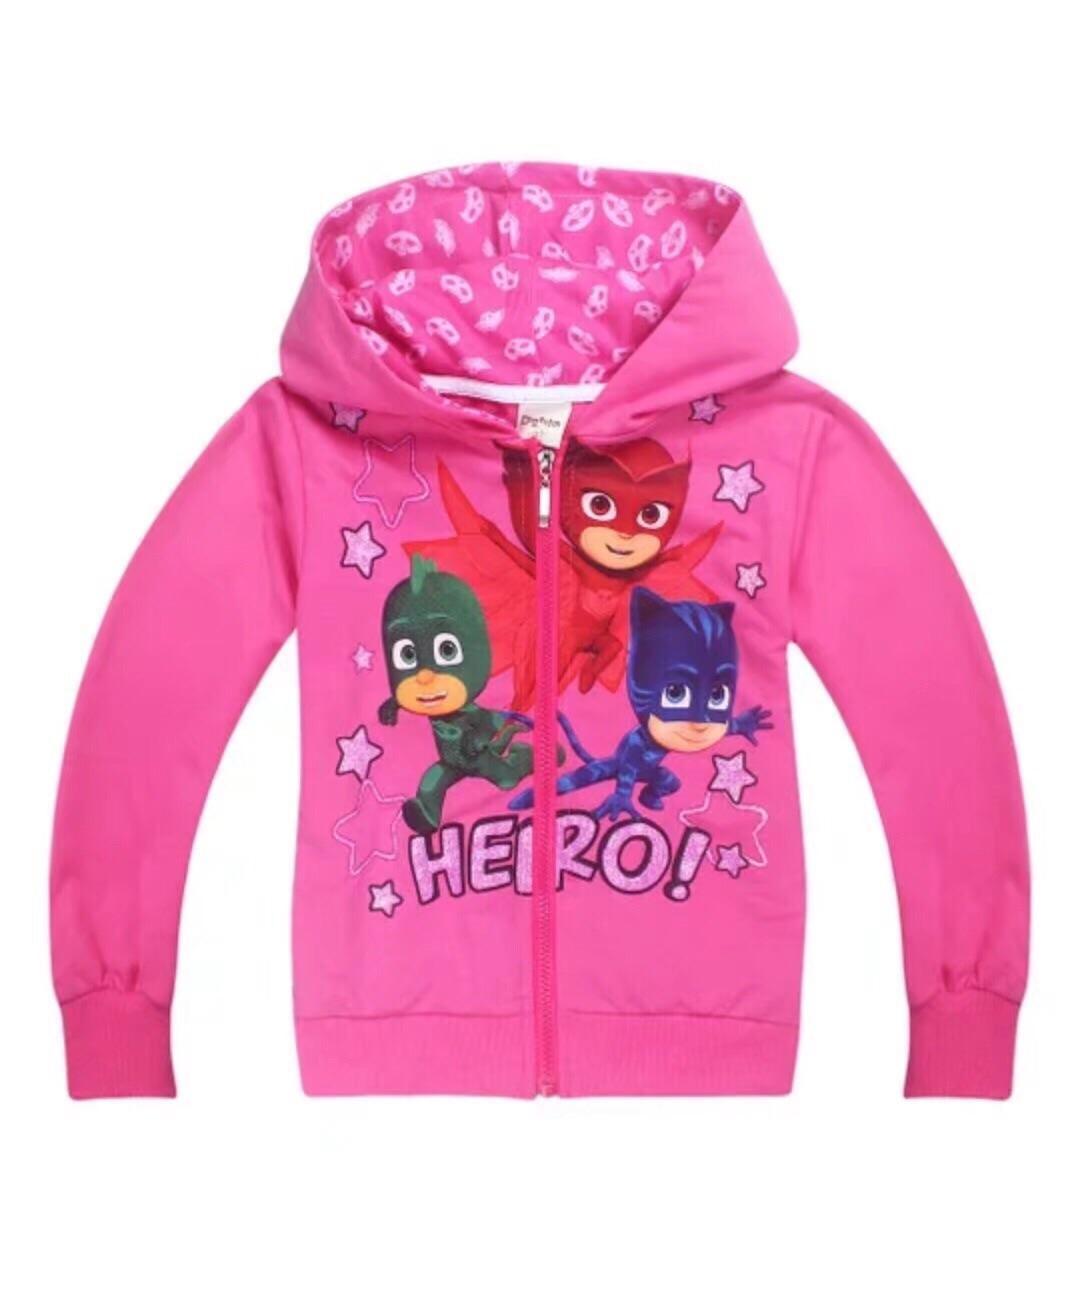 Review Kids Clothes Pj Mask Jacket Pj Mask Coat Oem On Singapore